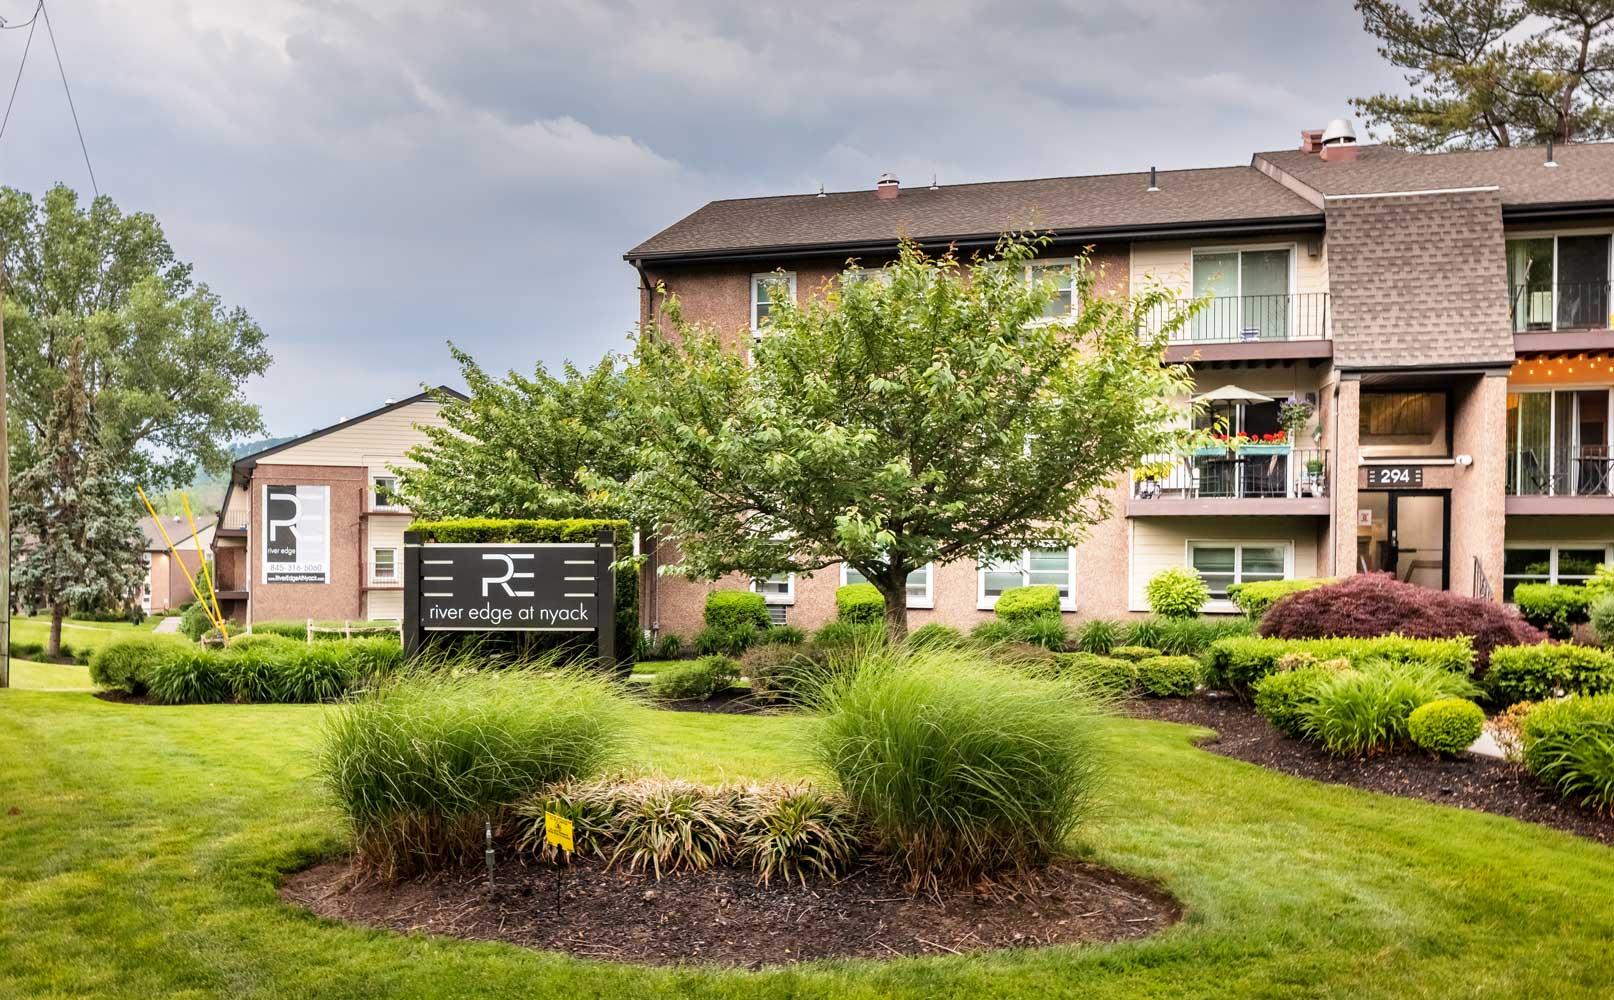 Laundry Facility Available at River Edge at Nyack Apartments in Nyack, NY